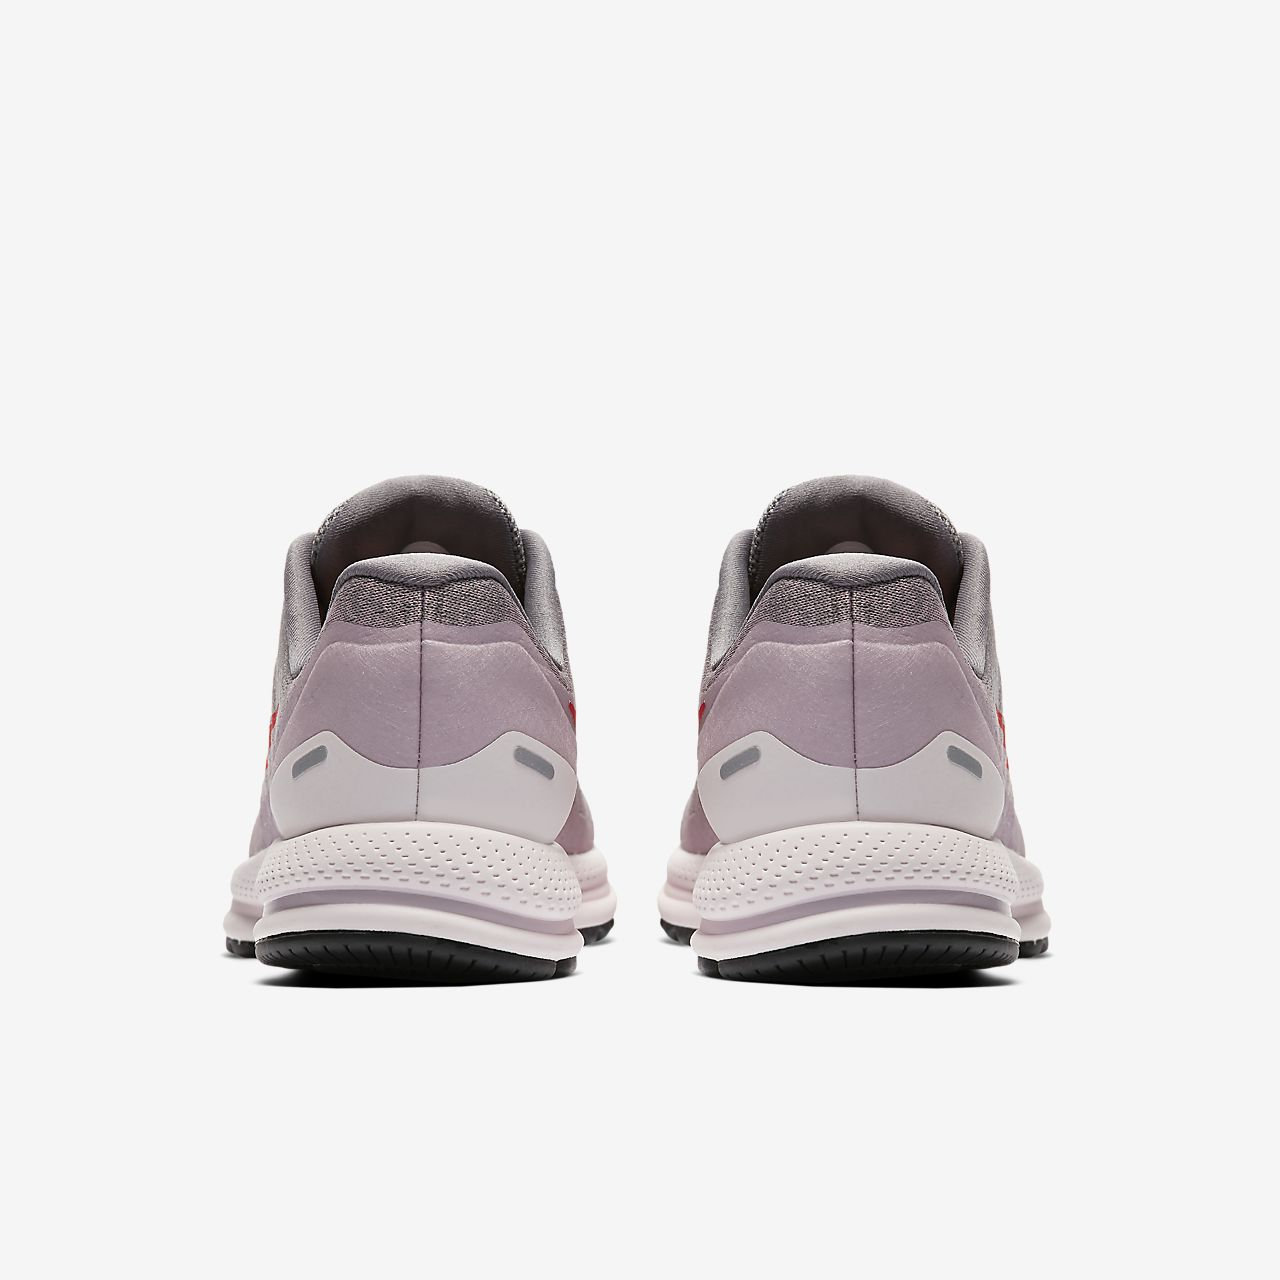 best service 96acb 02bd4 ... Nike Air Zoom Vomero 13 Women s Running Shoe